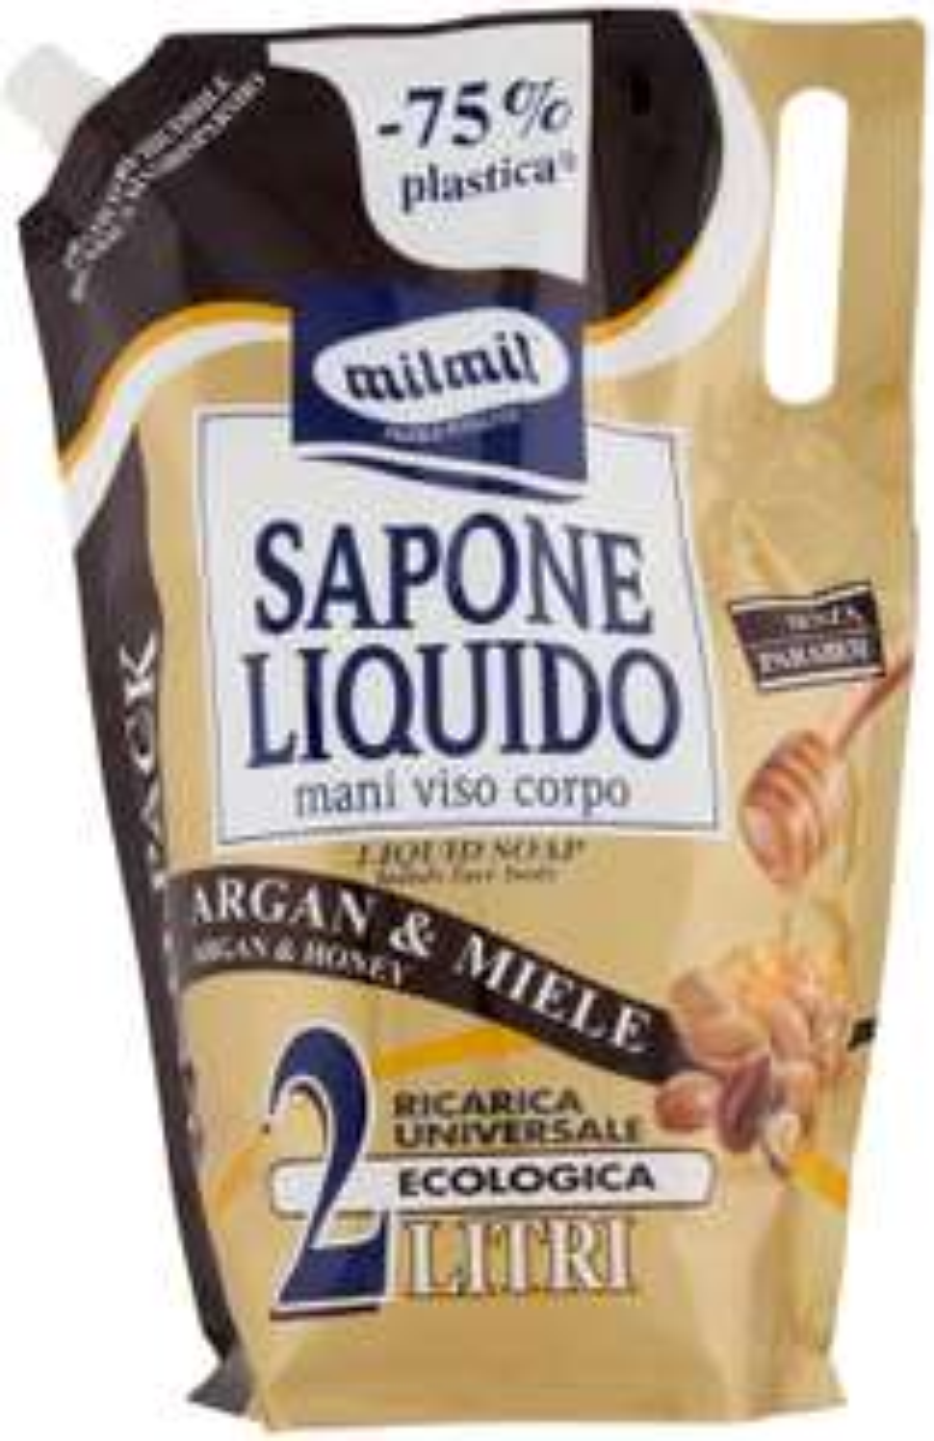 Mil Mil handwash 2L (=8x250ml bottles) £8.96 @ Amazon Prime / £13.45 Non Prime